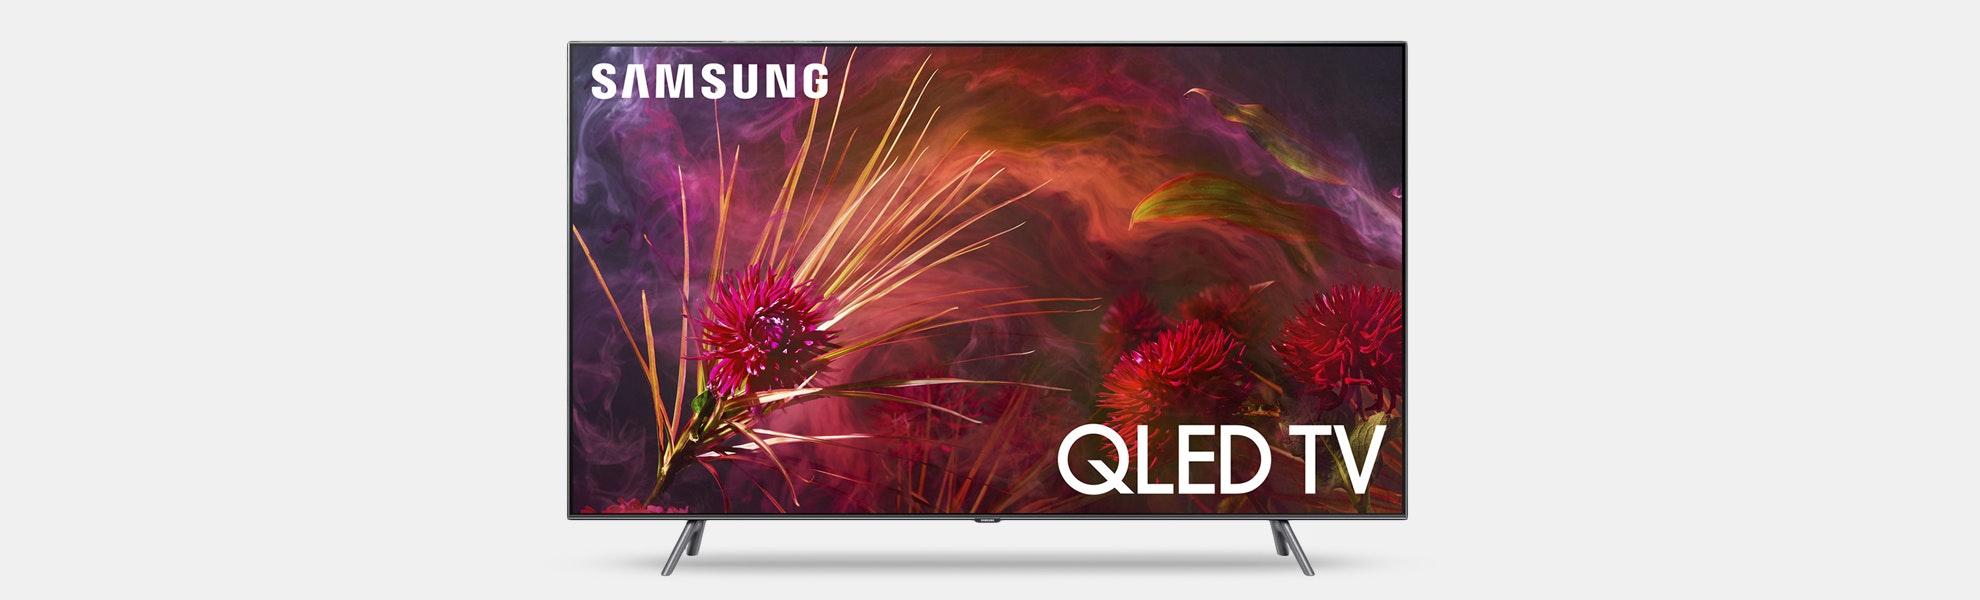 "Samsung Q8FN 55/65/75"" QLED Smart 4K UHD TV"